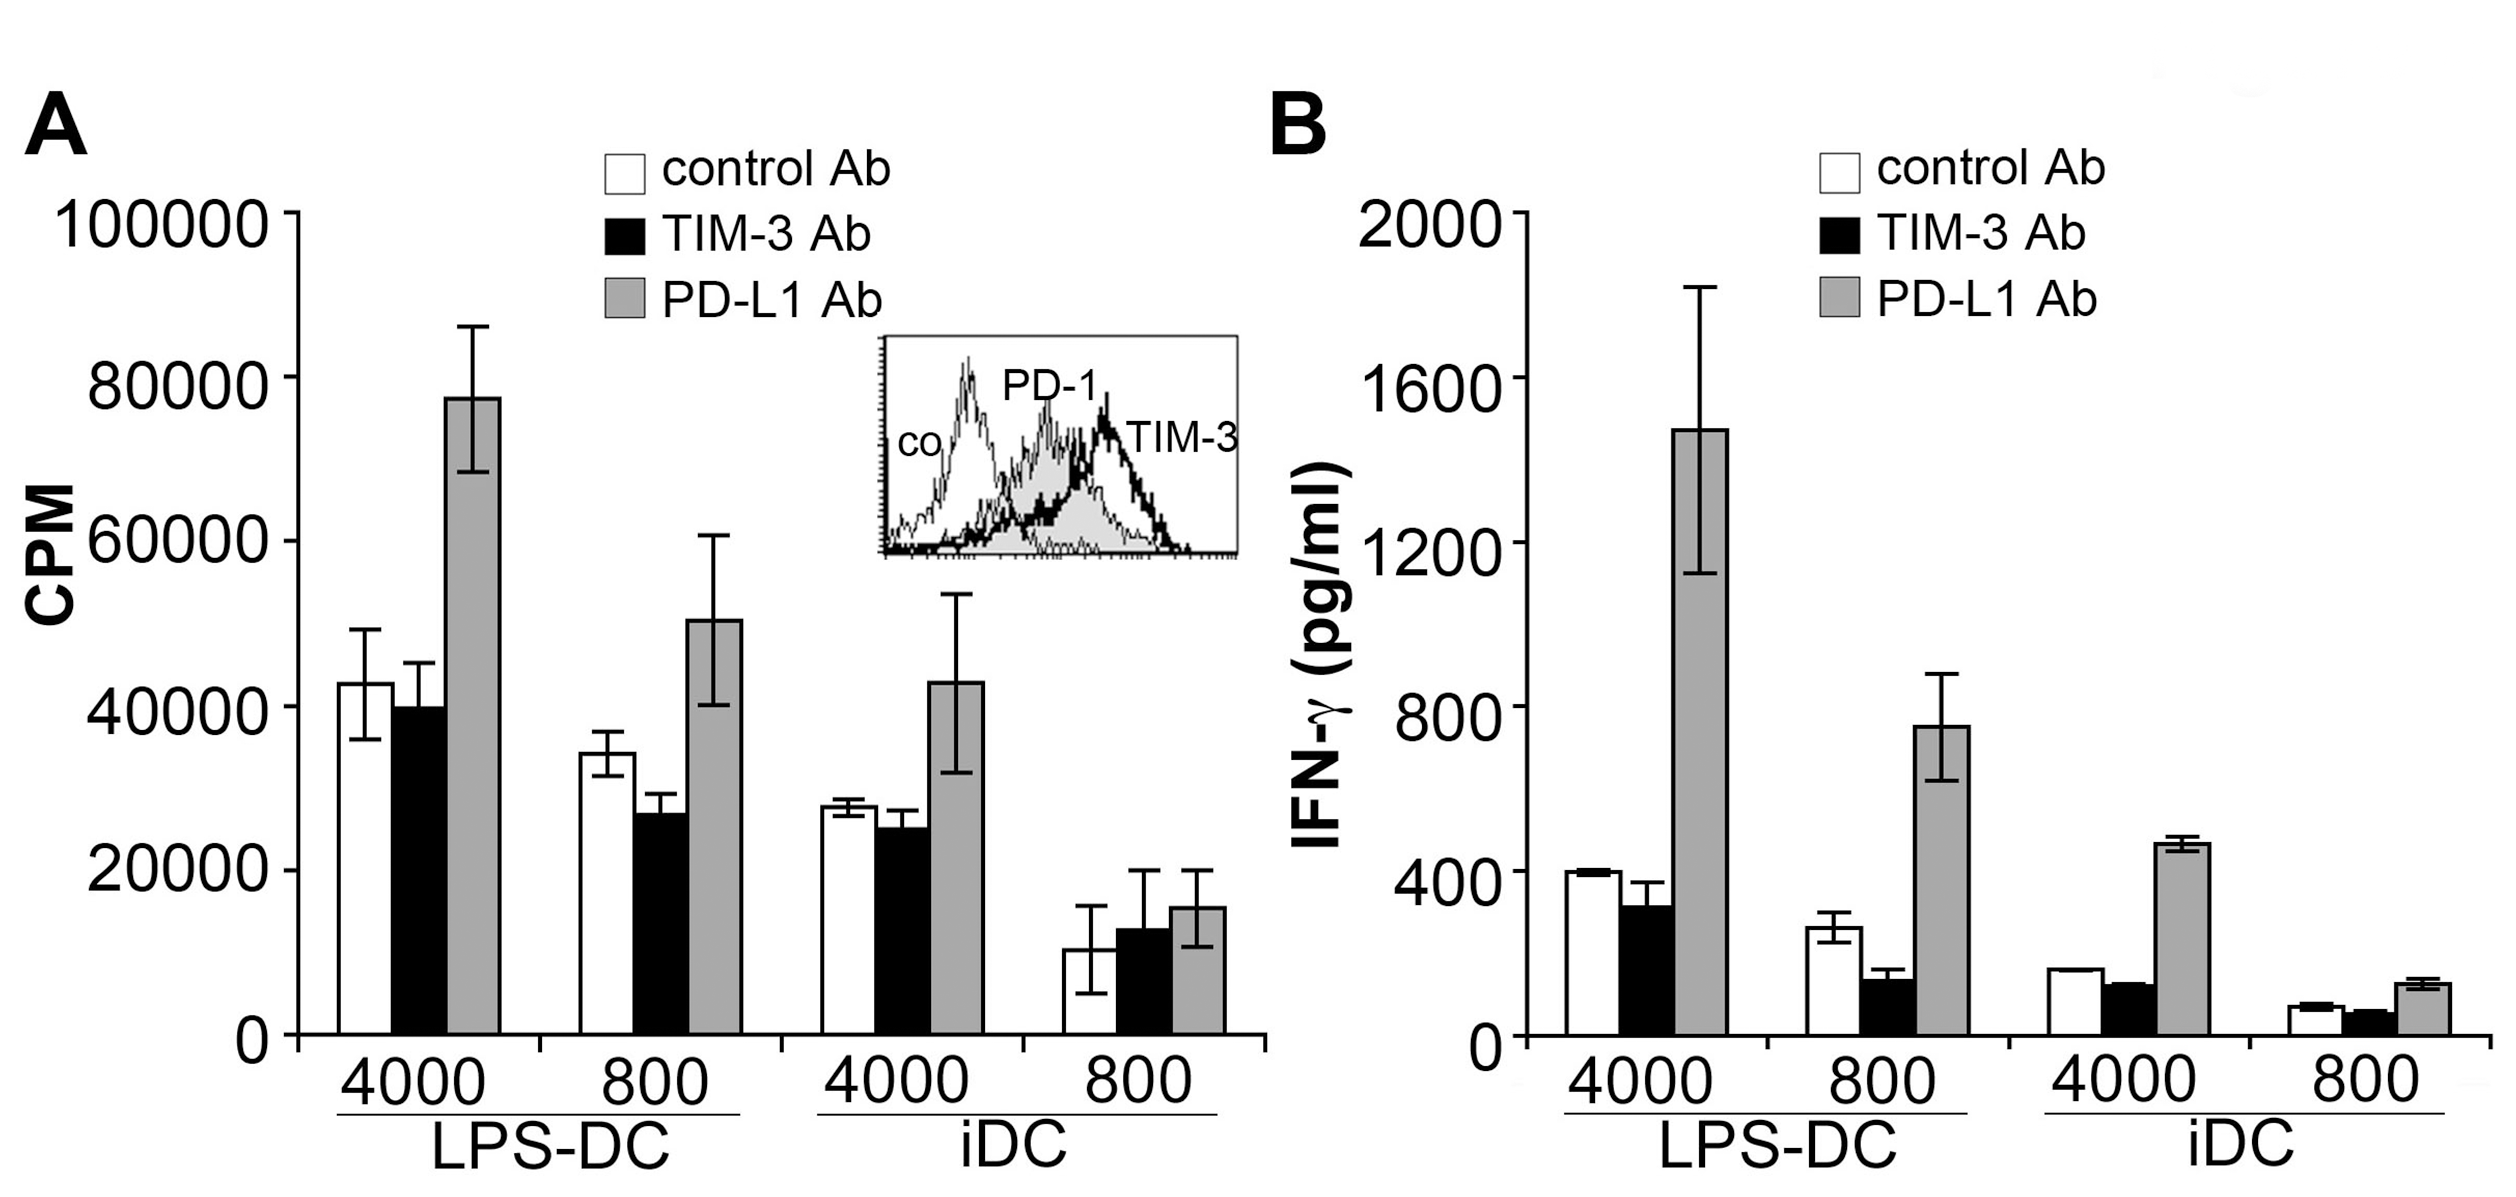 PD-L blockade but not TIM-3 antibodies increase allogeneic responses of human Th1 cells.